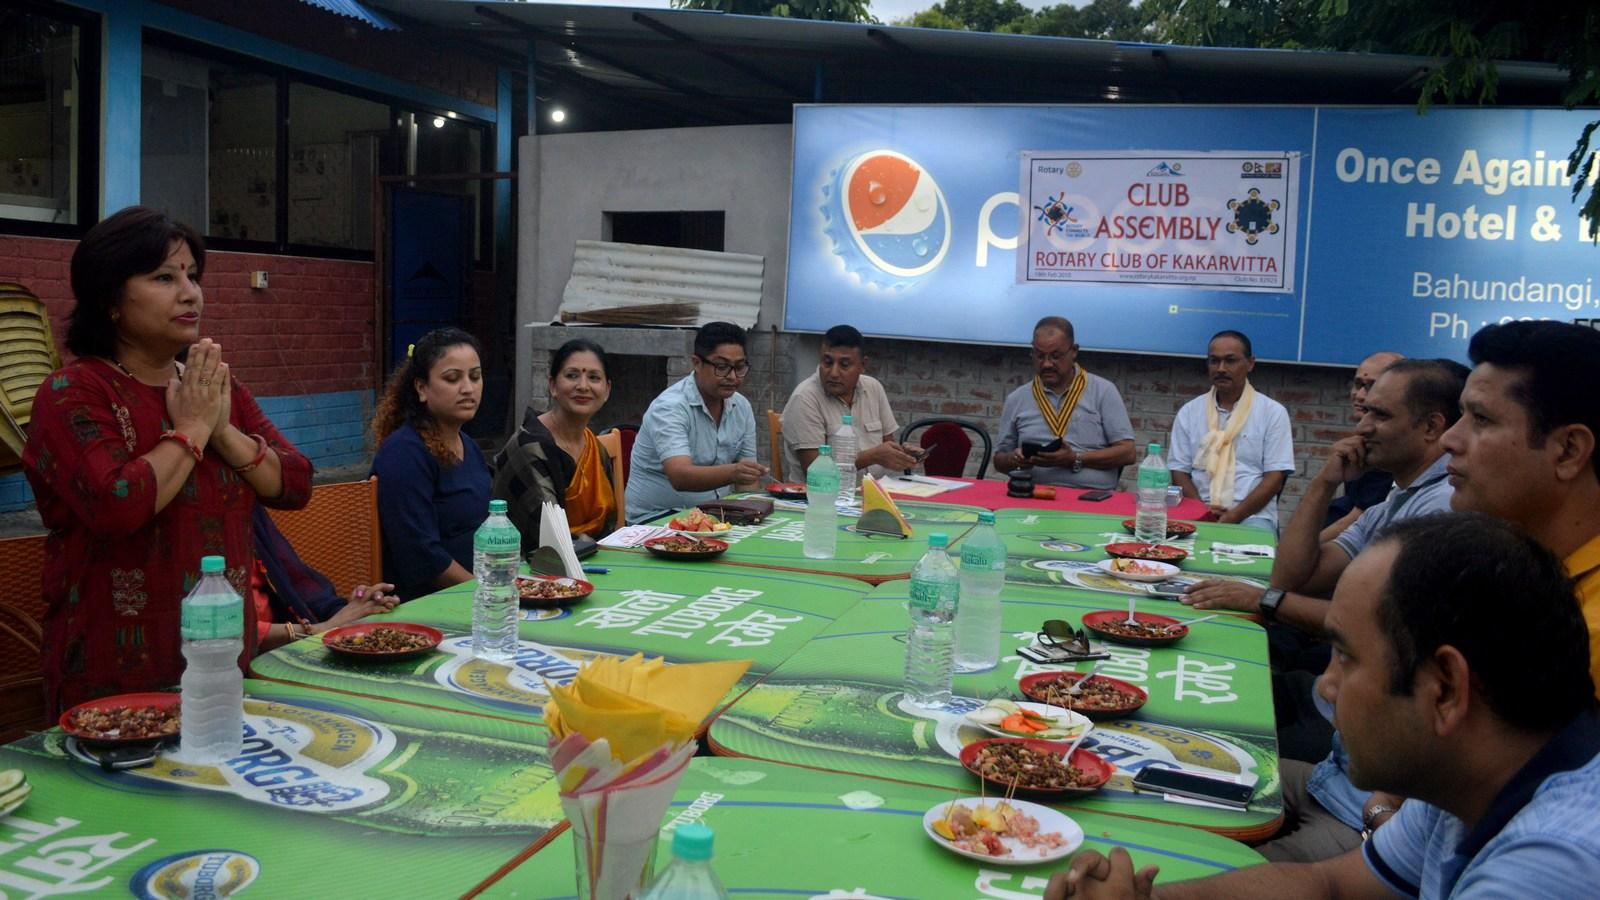 1st-Club-Assembly-2018-19-Rotary-Club-of-Kakarvitta-16